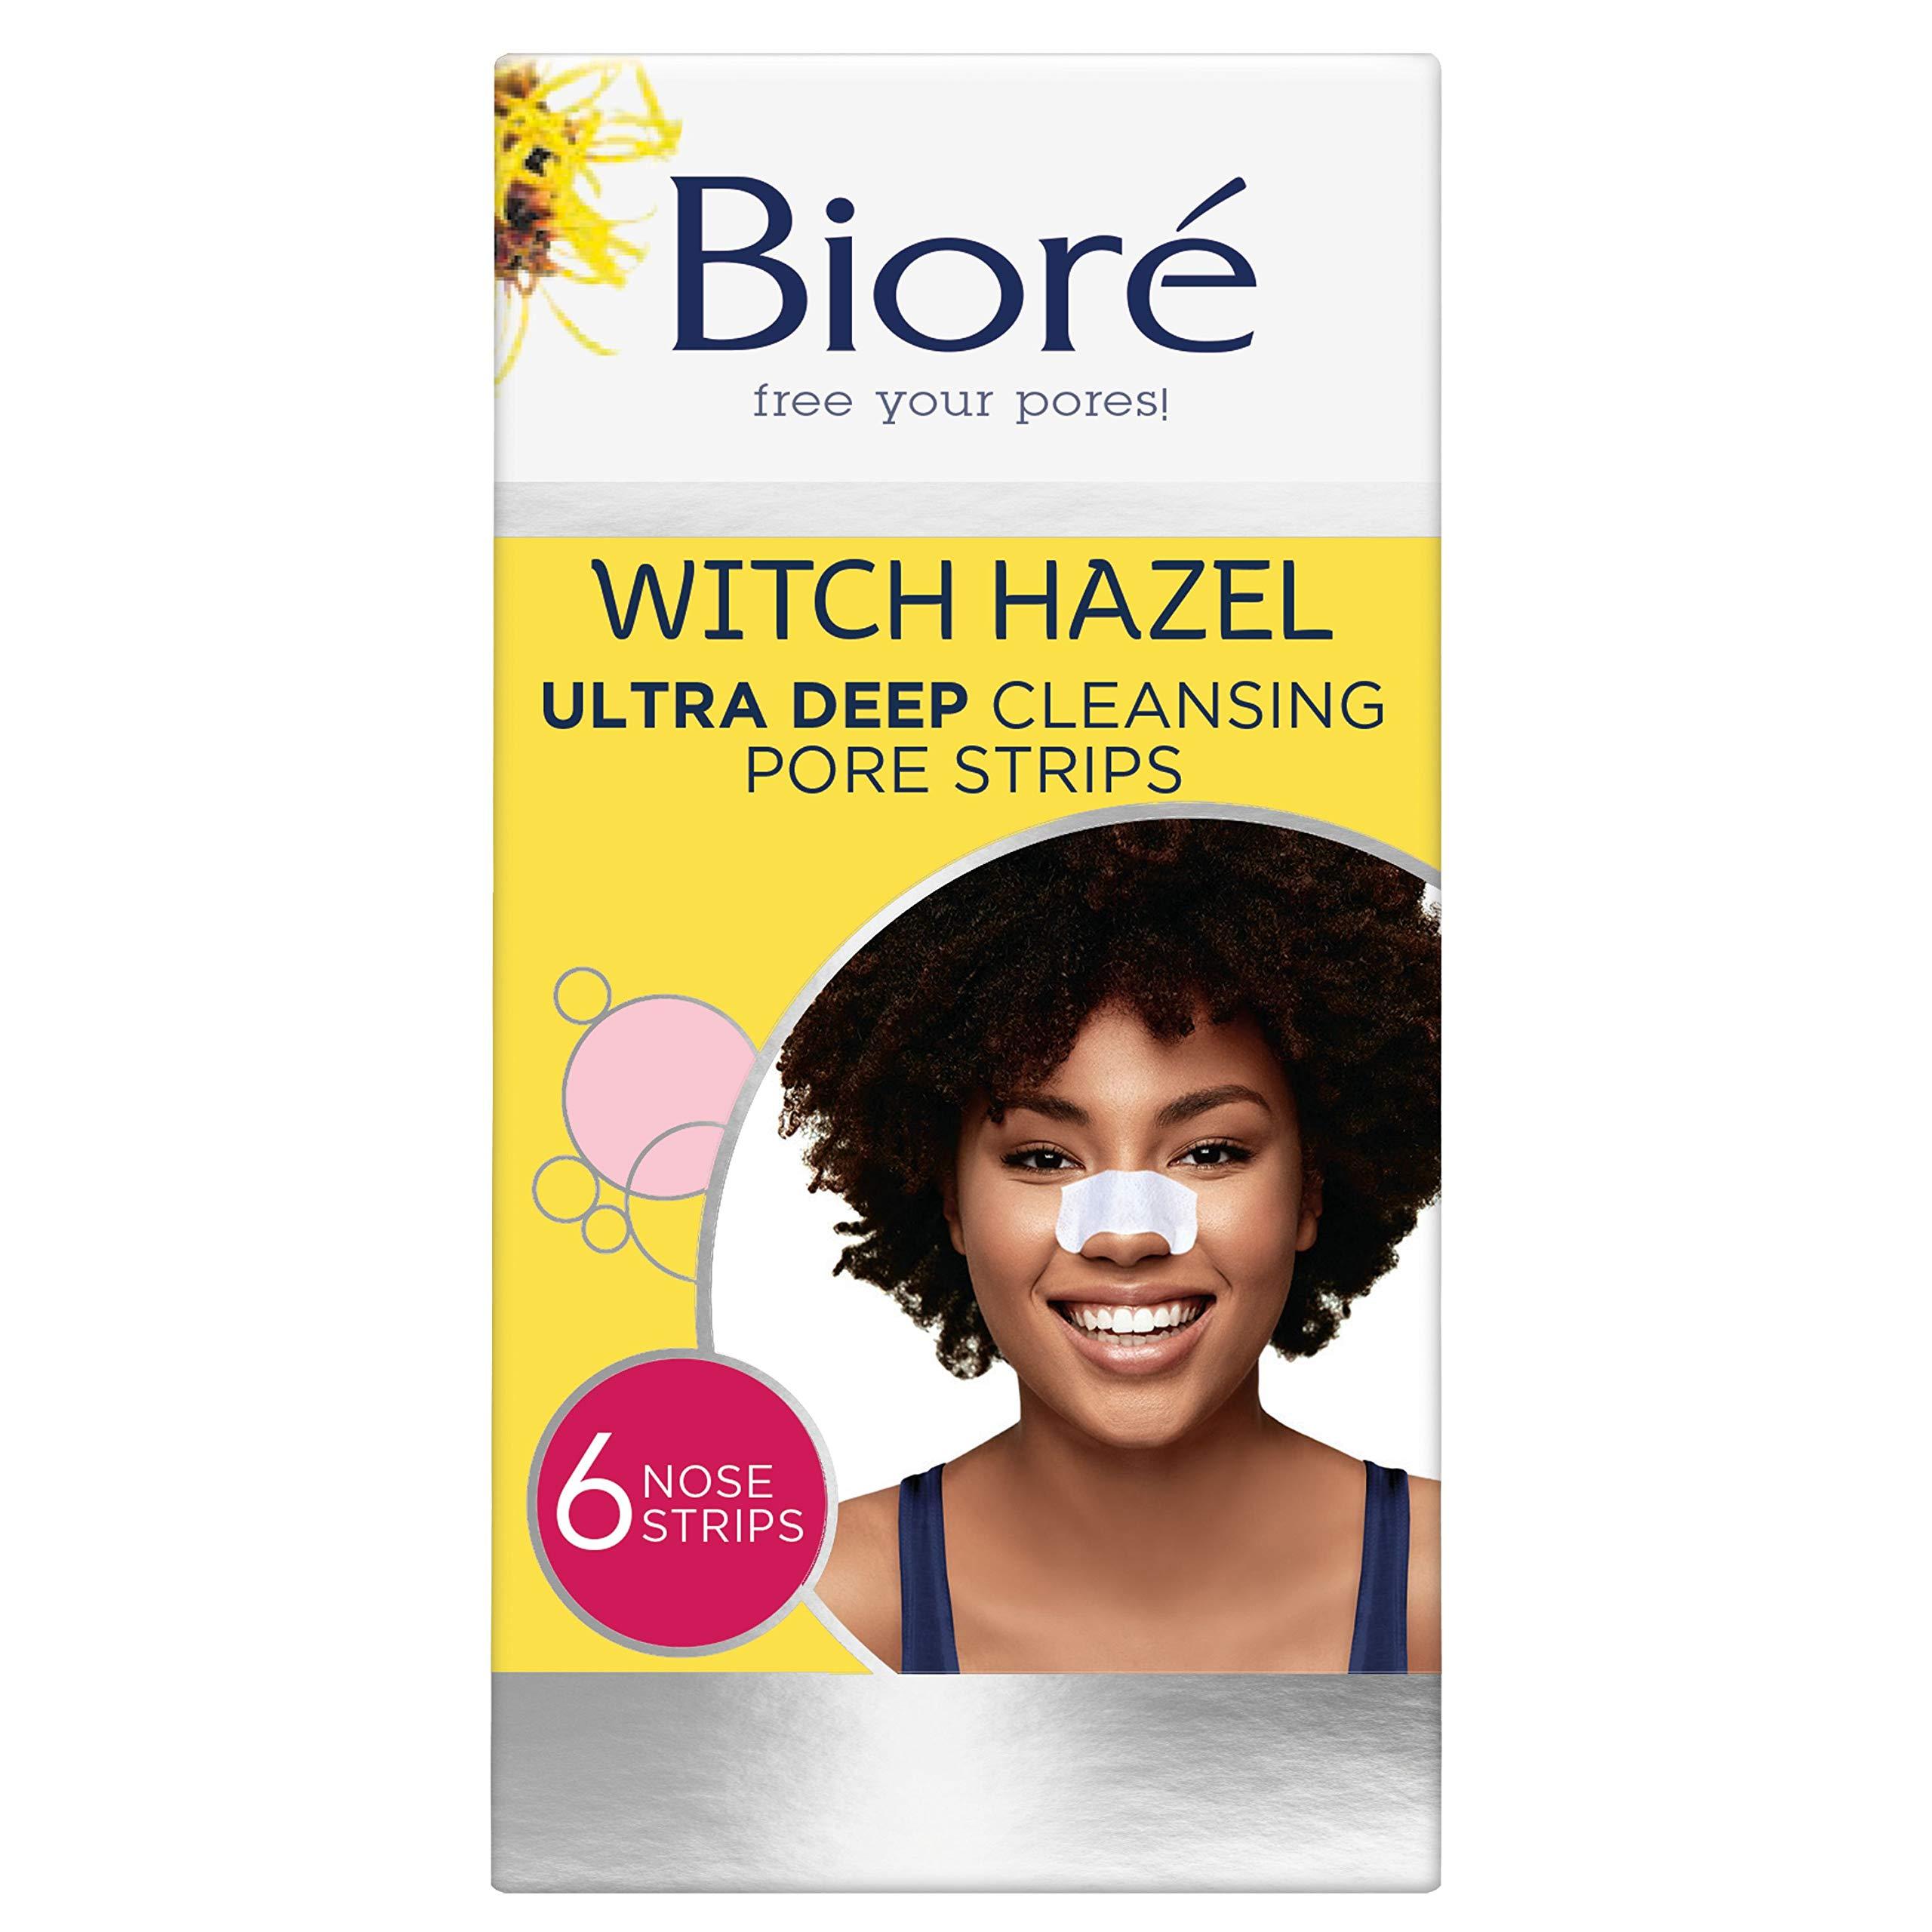 Biore Ultra Deep Cleansing Pore Strips, 6 each